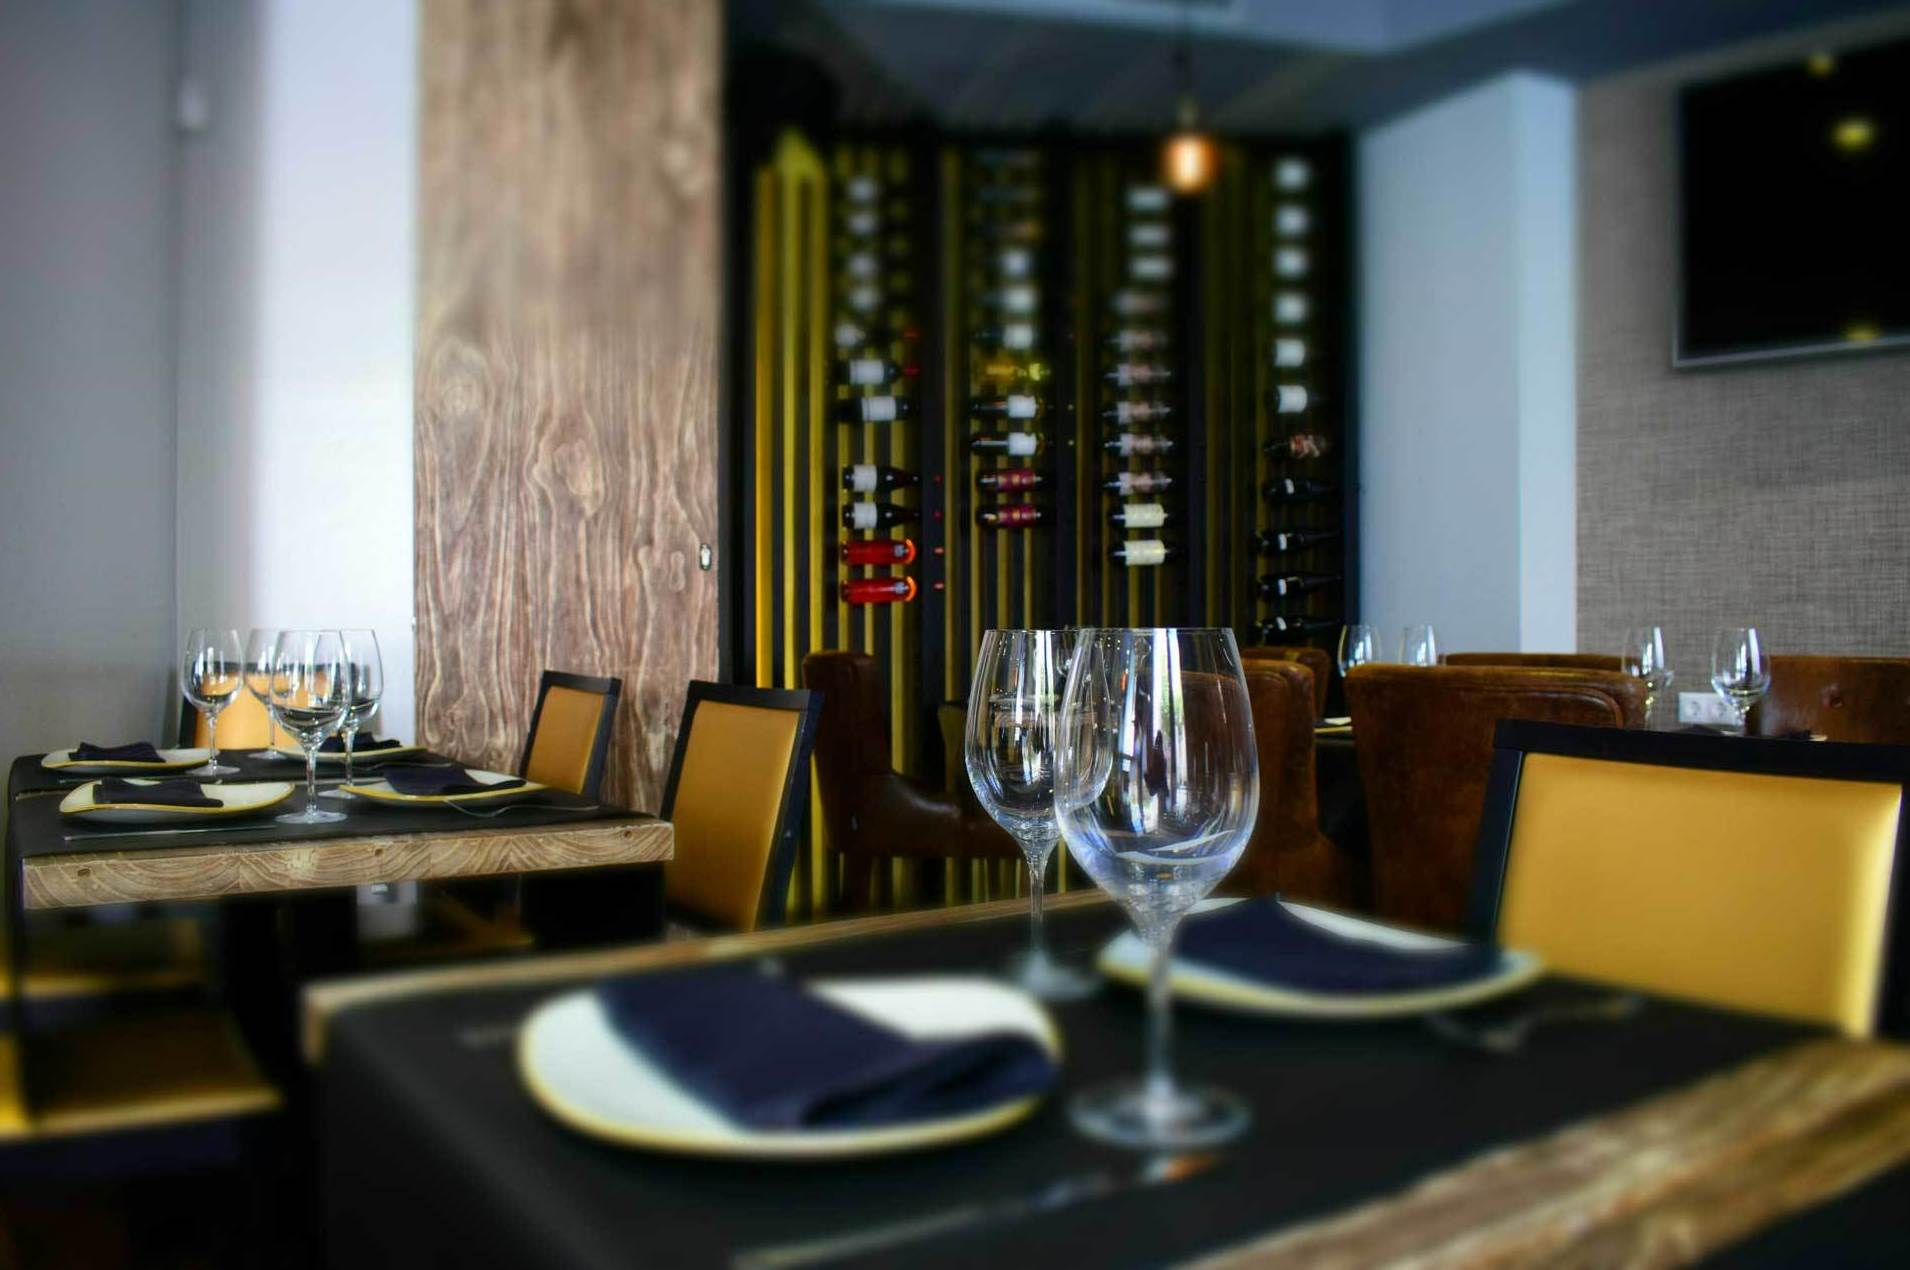 Foto 2 de Cocina mediterránea en Almería | Restaurante Casco Antiguo